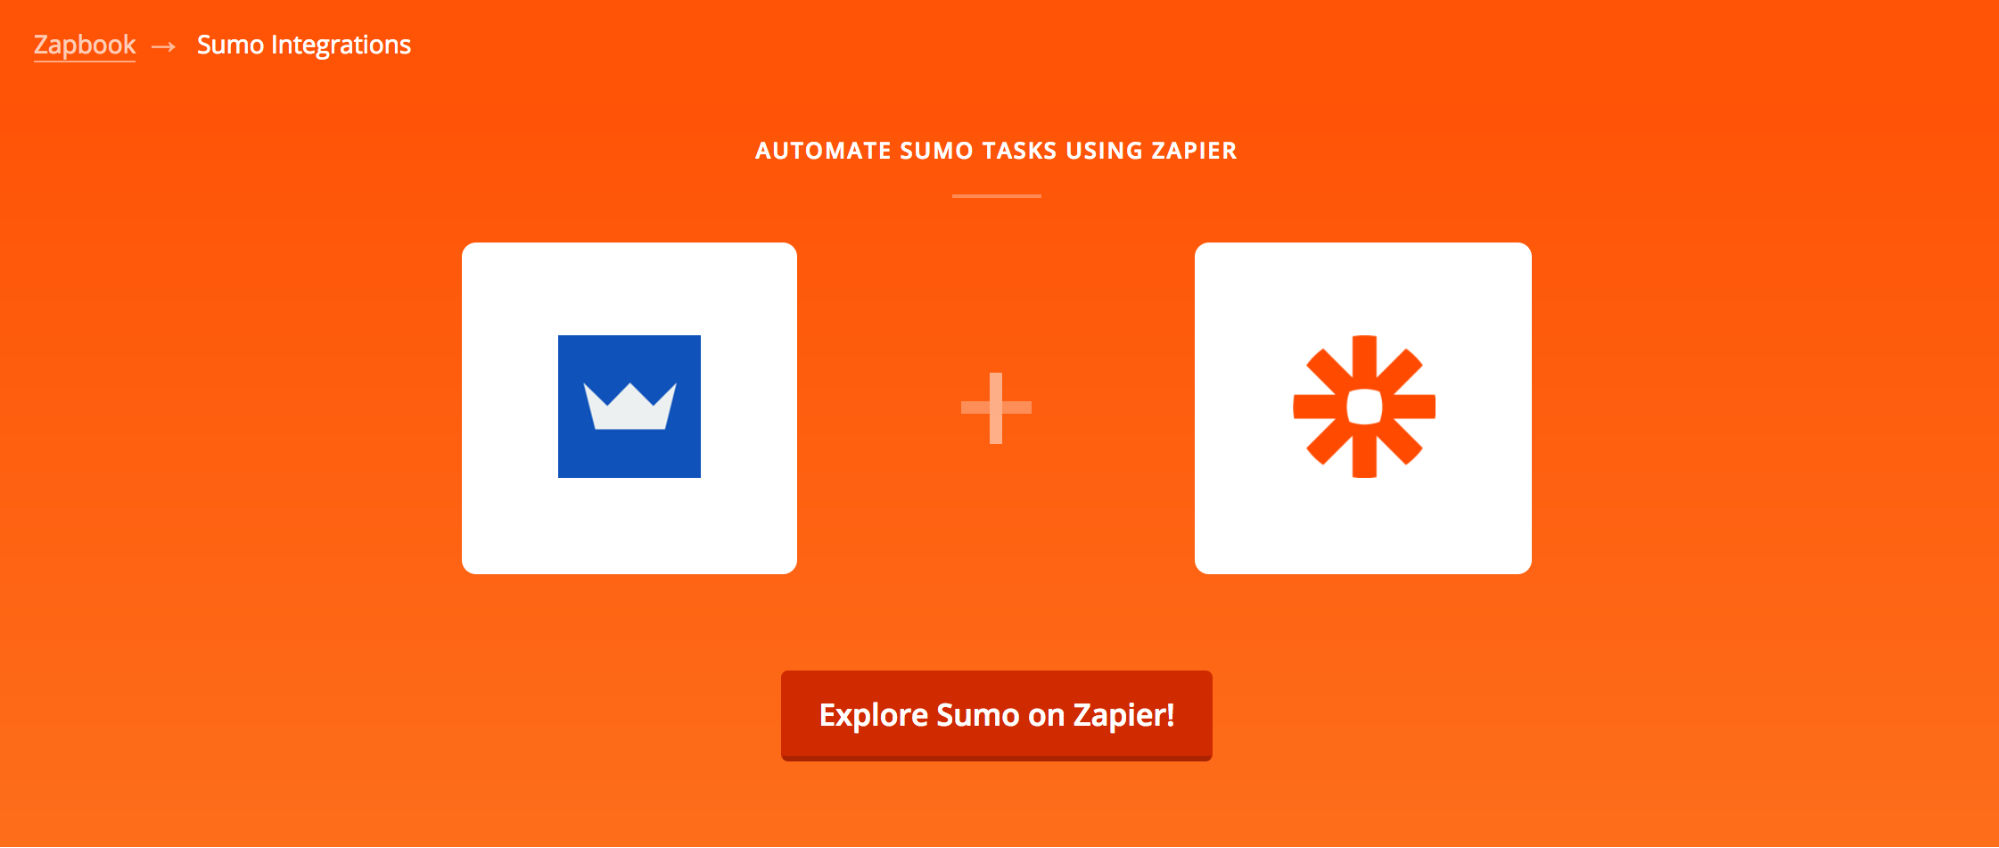 Screenshot showing Sumo + Zapier integration image